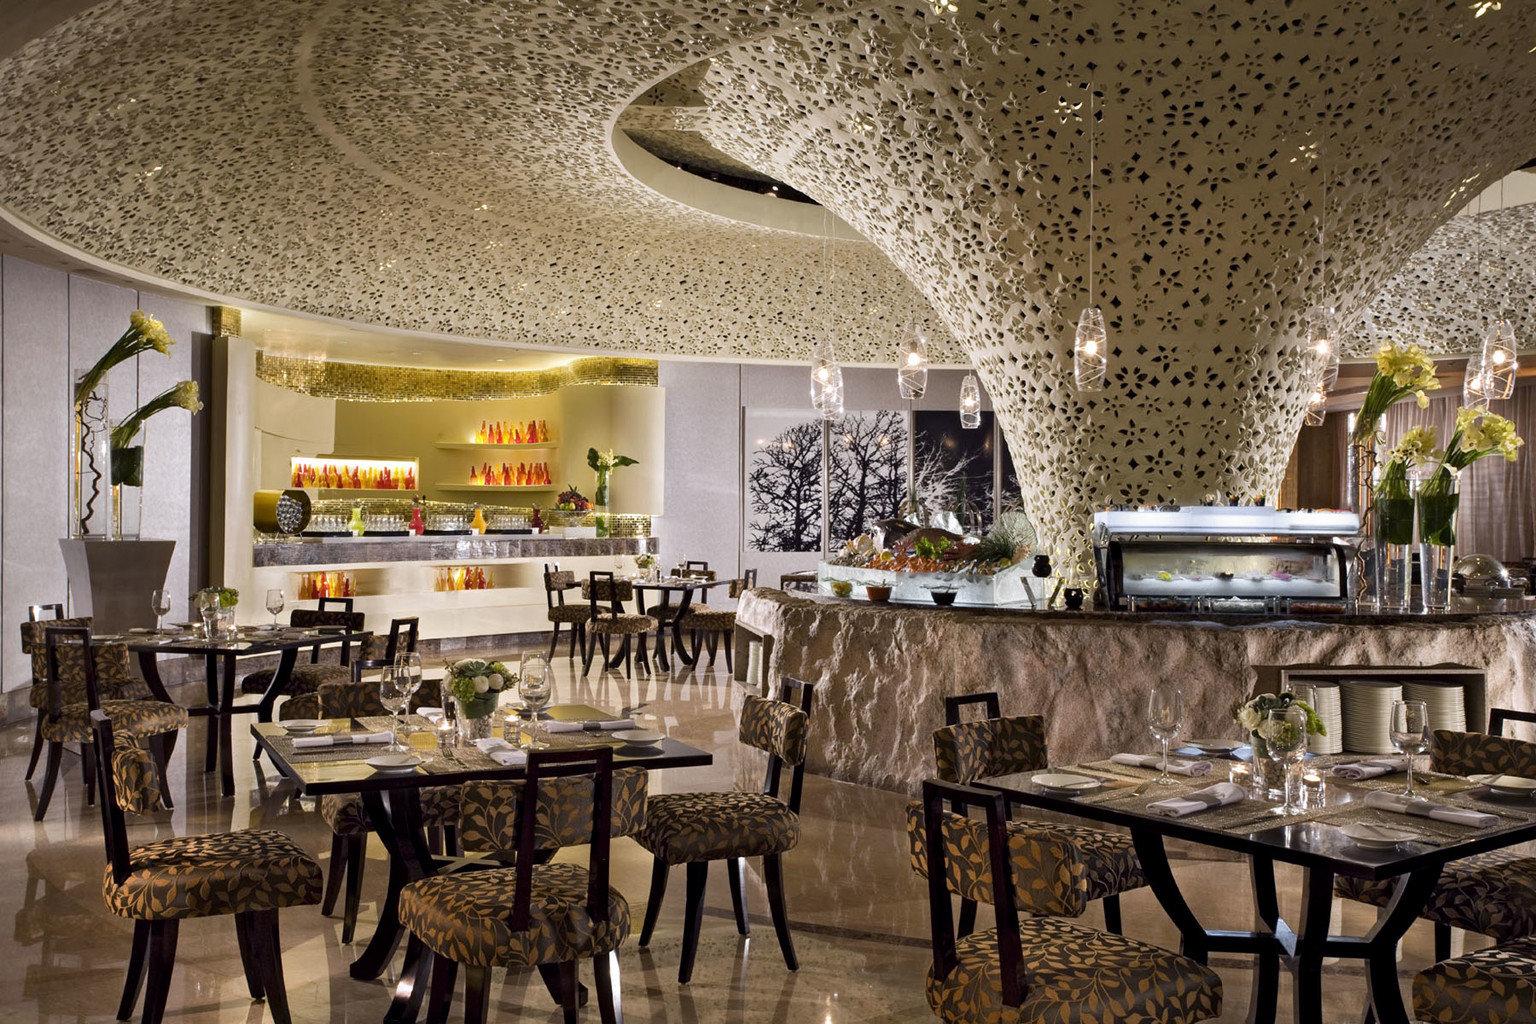 Dining Luxury Romance chair restaurant function hall ballroom dining table